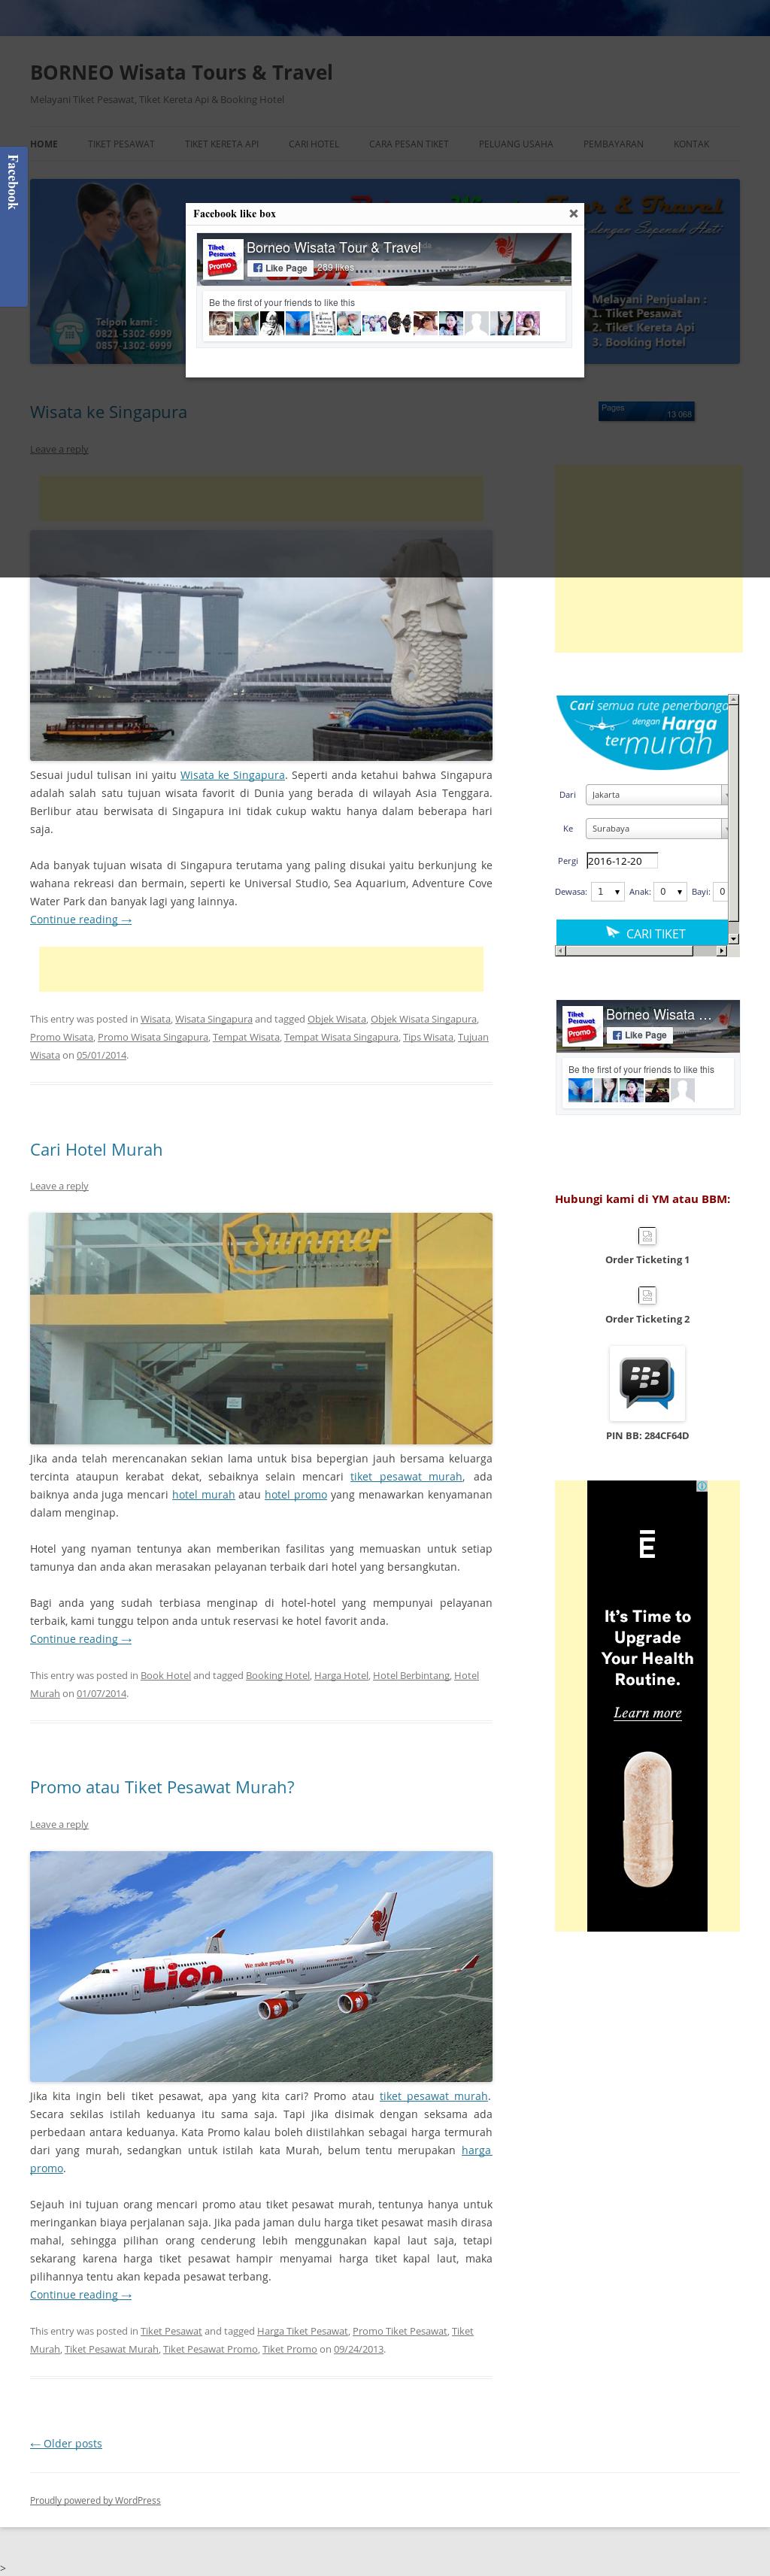 Borneo Wisata Tour Travel Competitors Revenue And Employees Adventure Cove Waterpark Singapore Dewasa Tiket Owler Company Profile